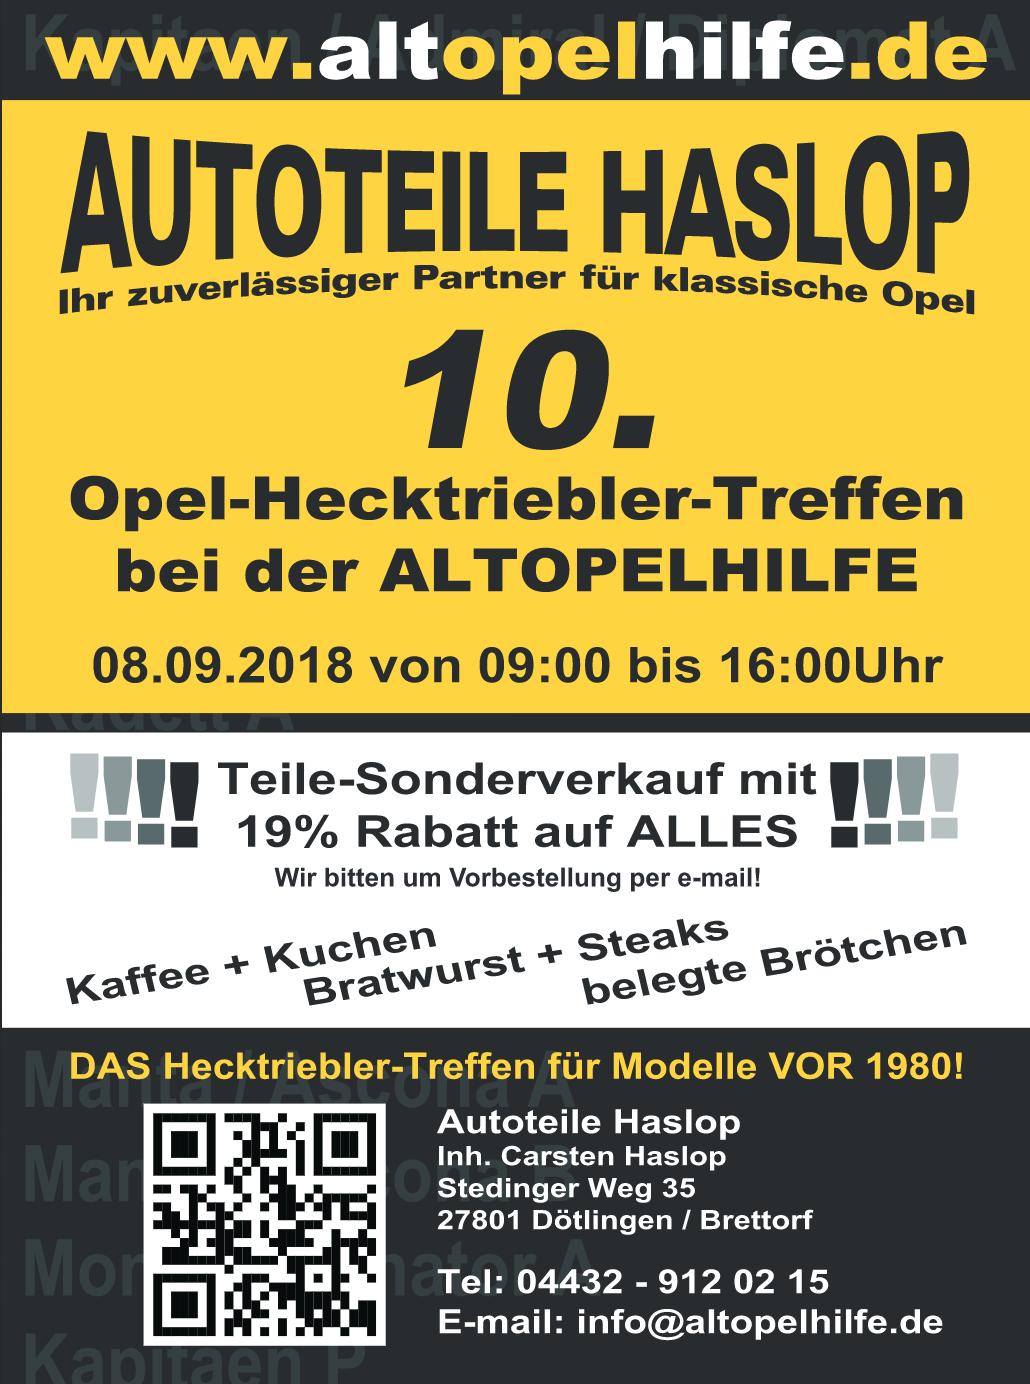 Altopelhilfe - Altopel Hilfe Online Shop